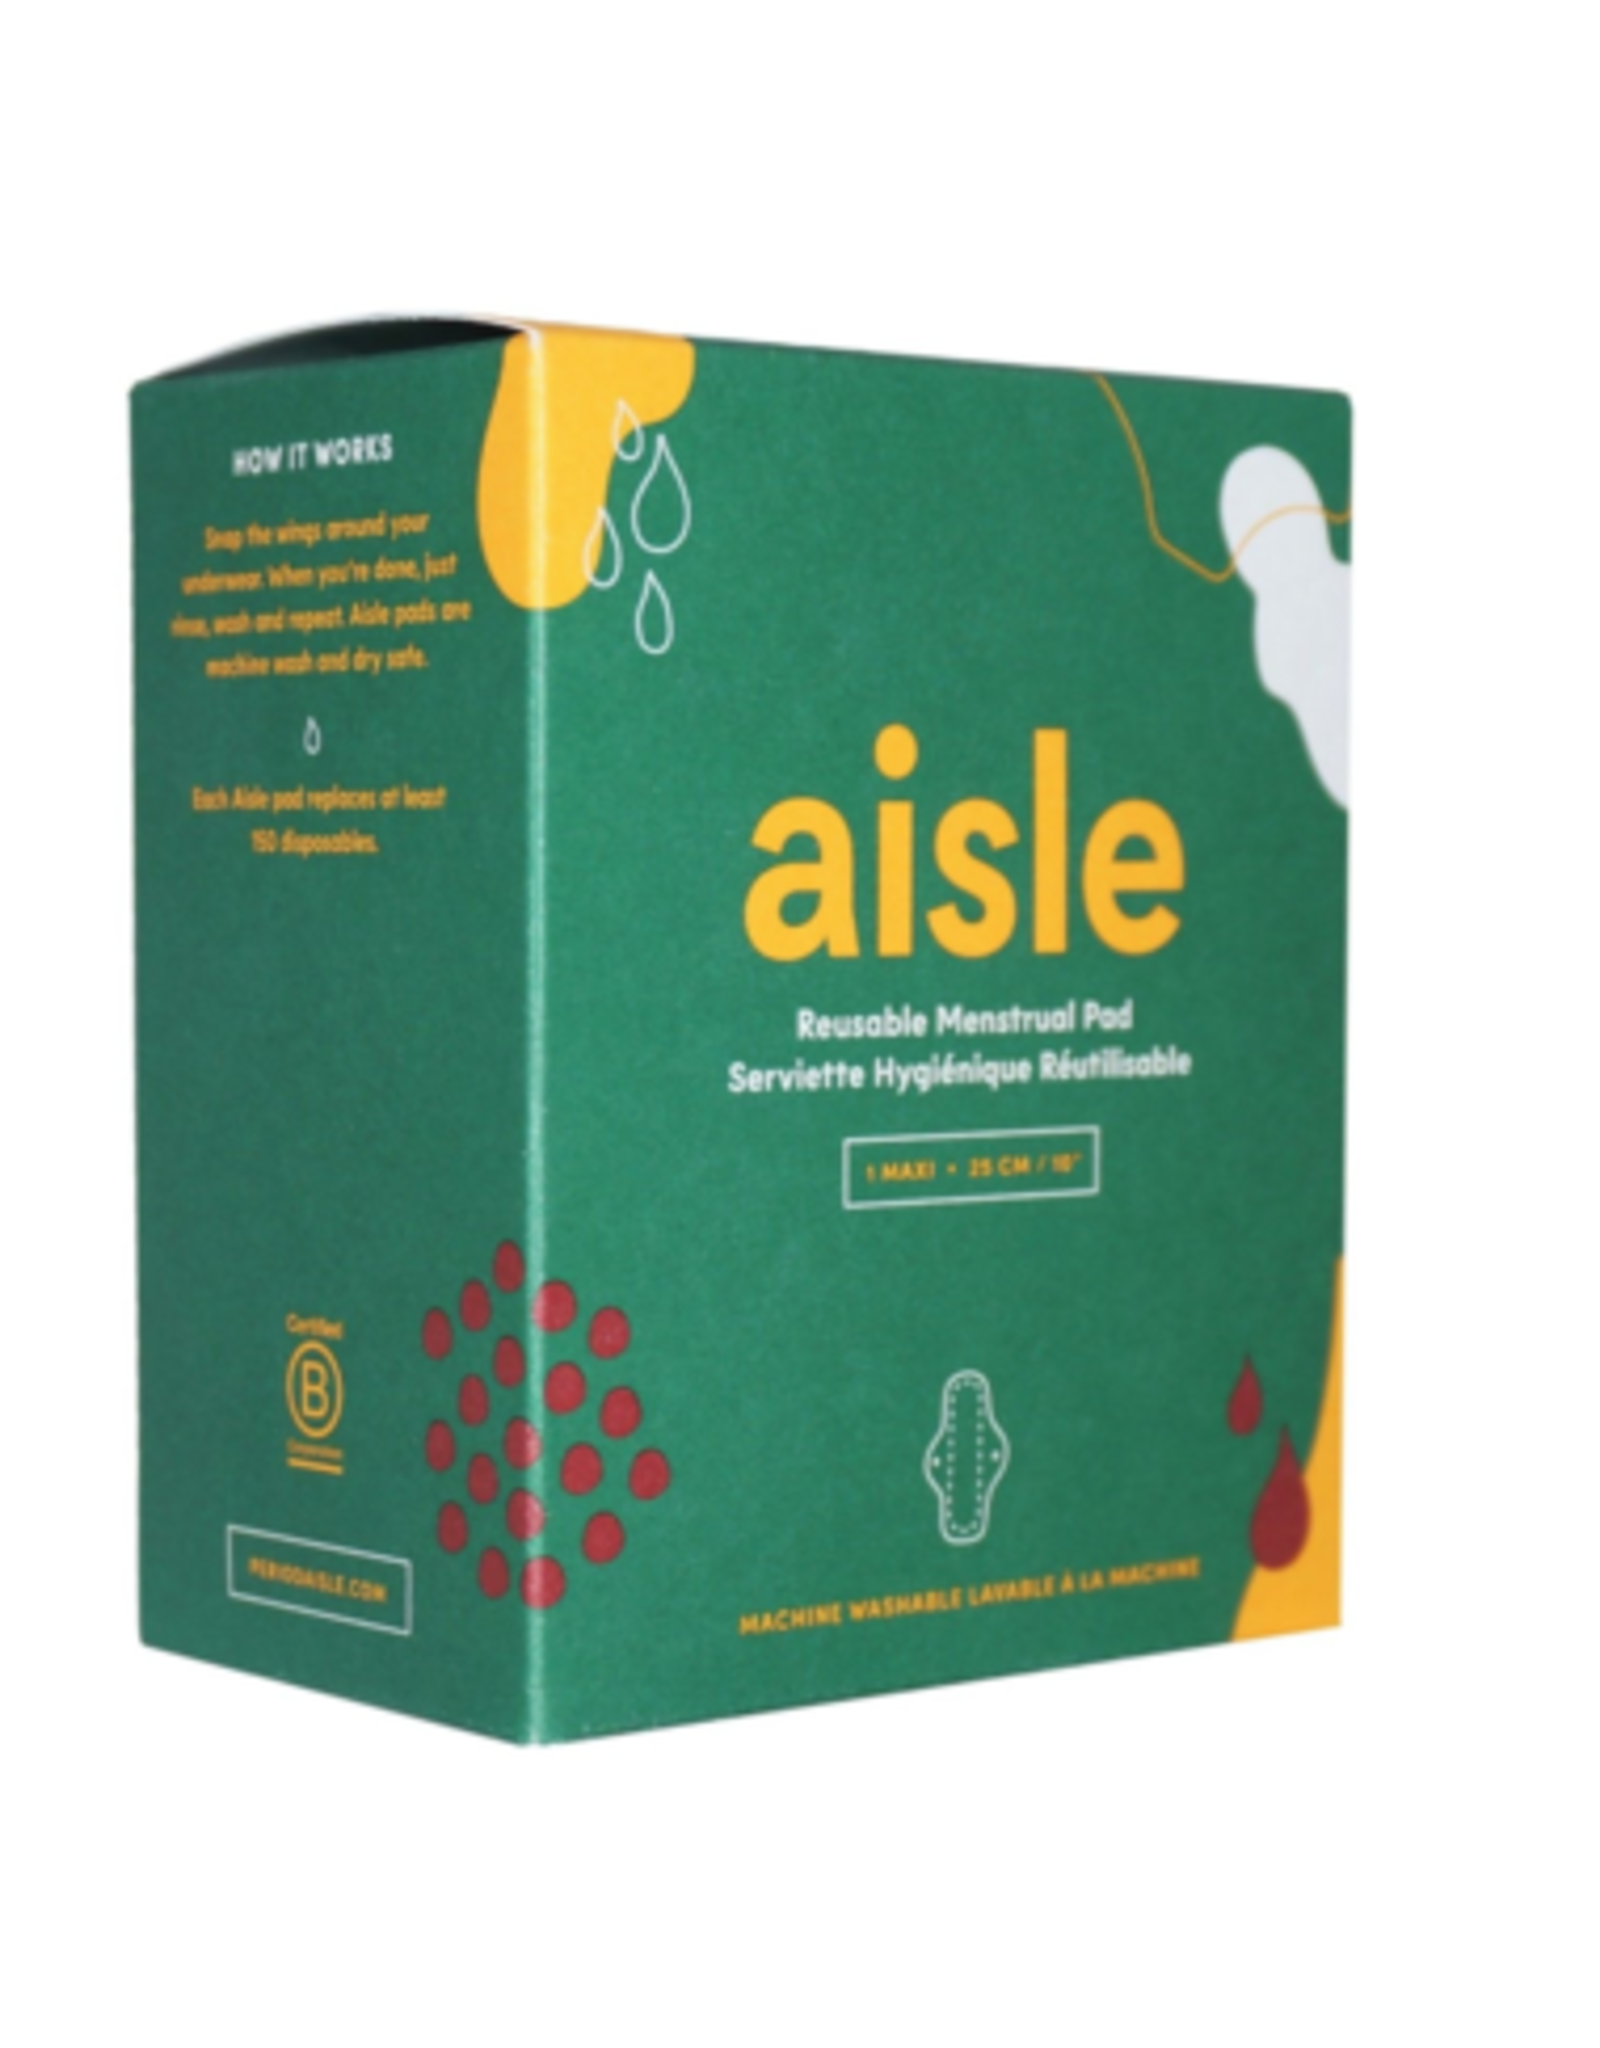 Aisle Reusable Menstrual Pad